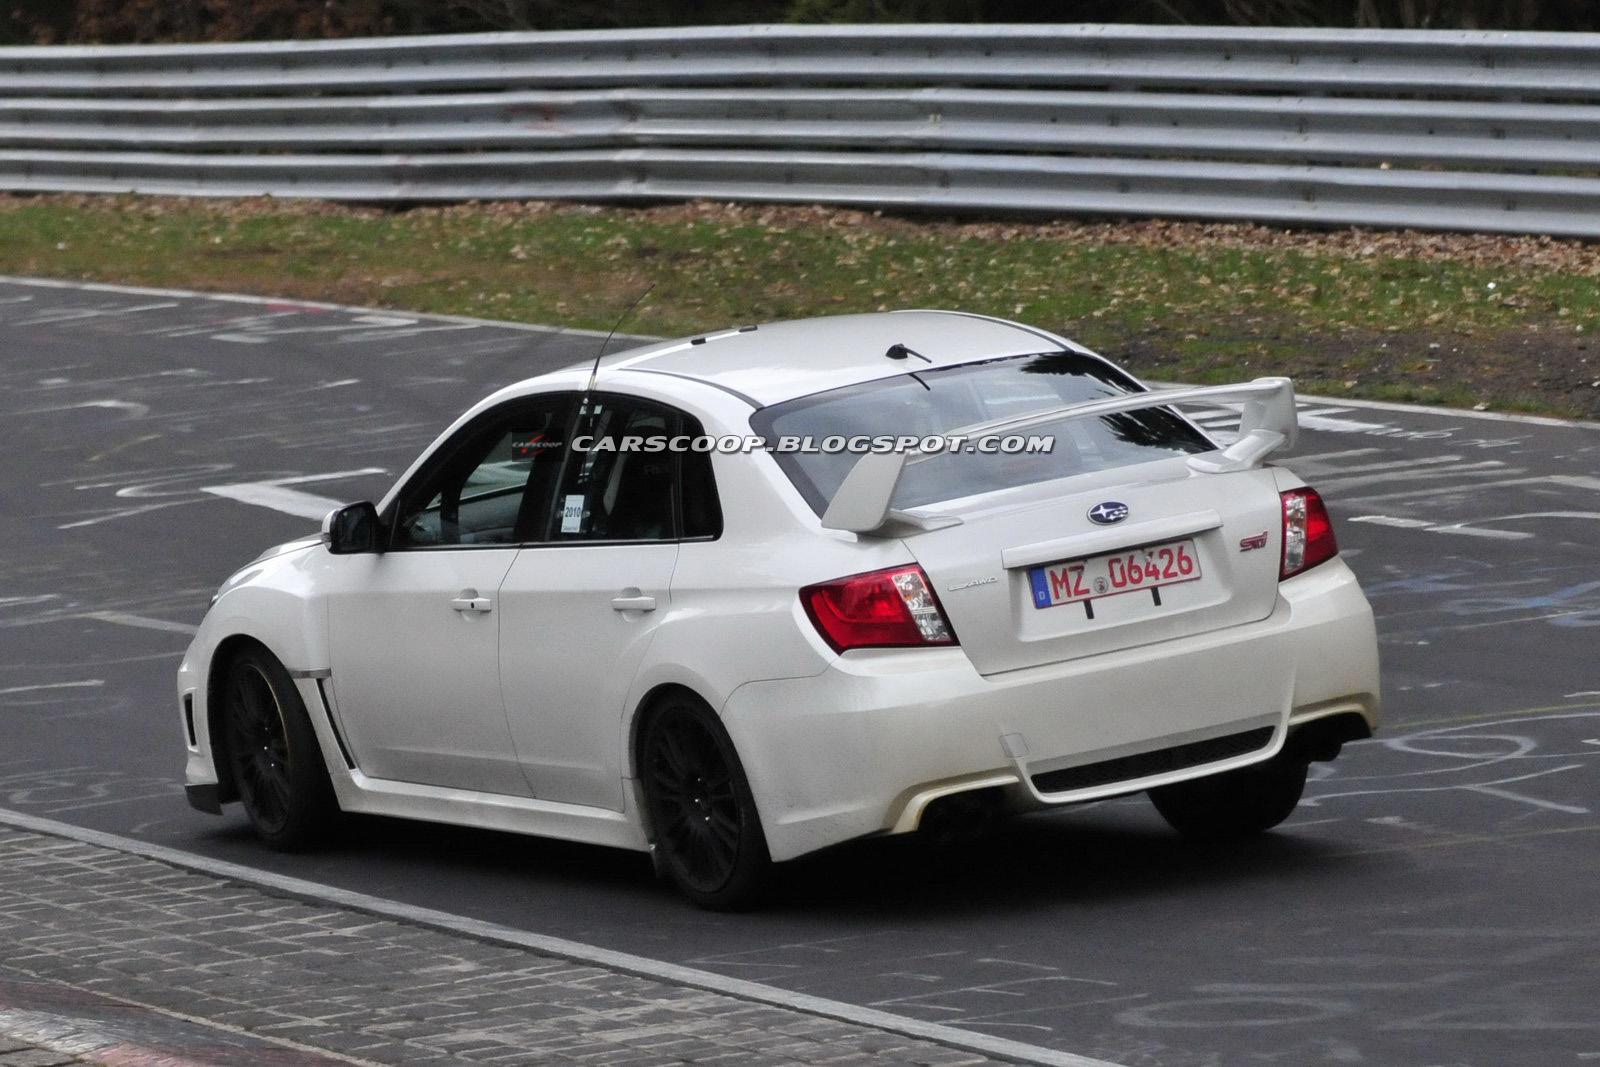 SPIED 2011 Subaru Impreza WRX STI Spec C Sedan Scooped at the Ring